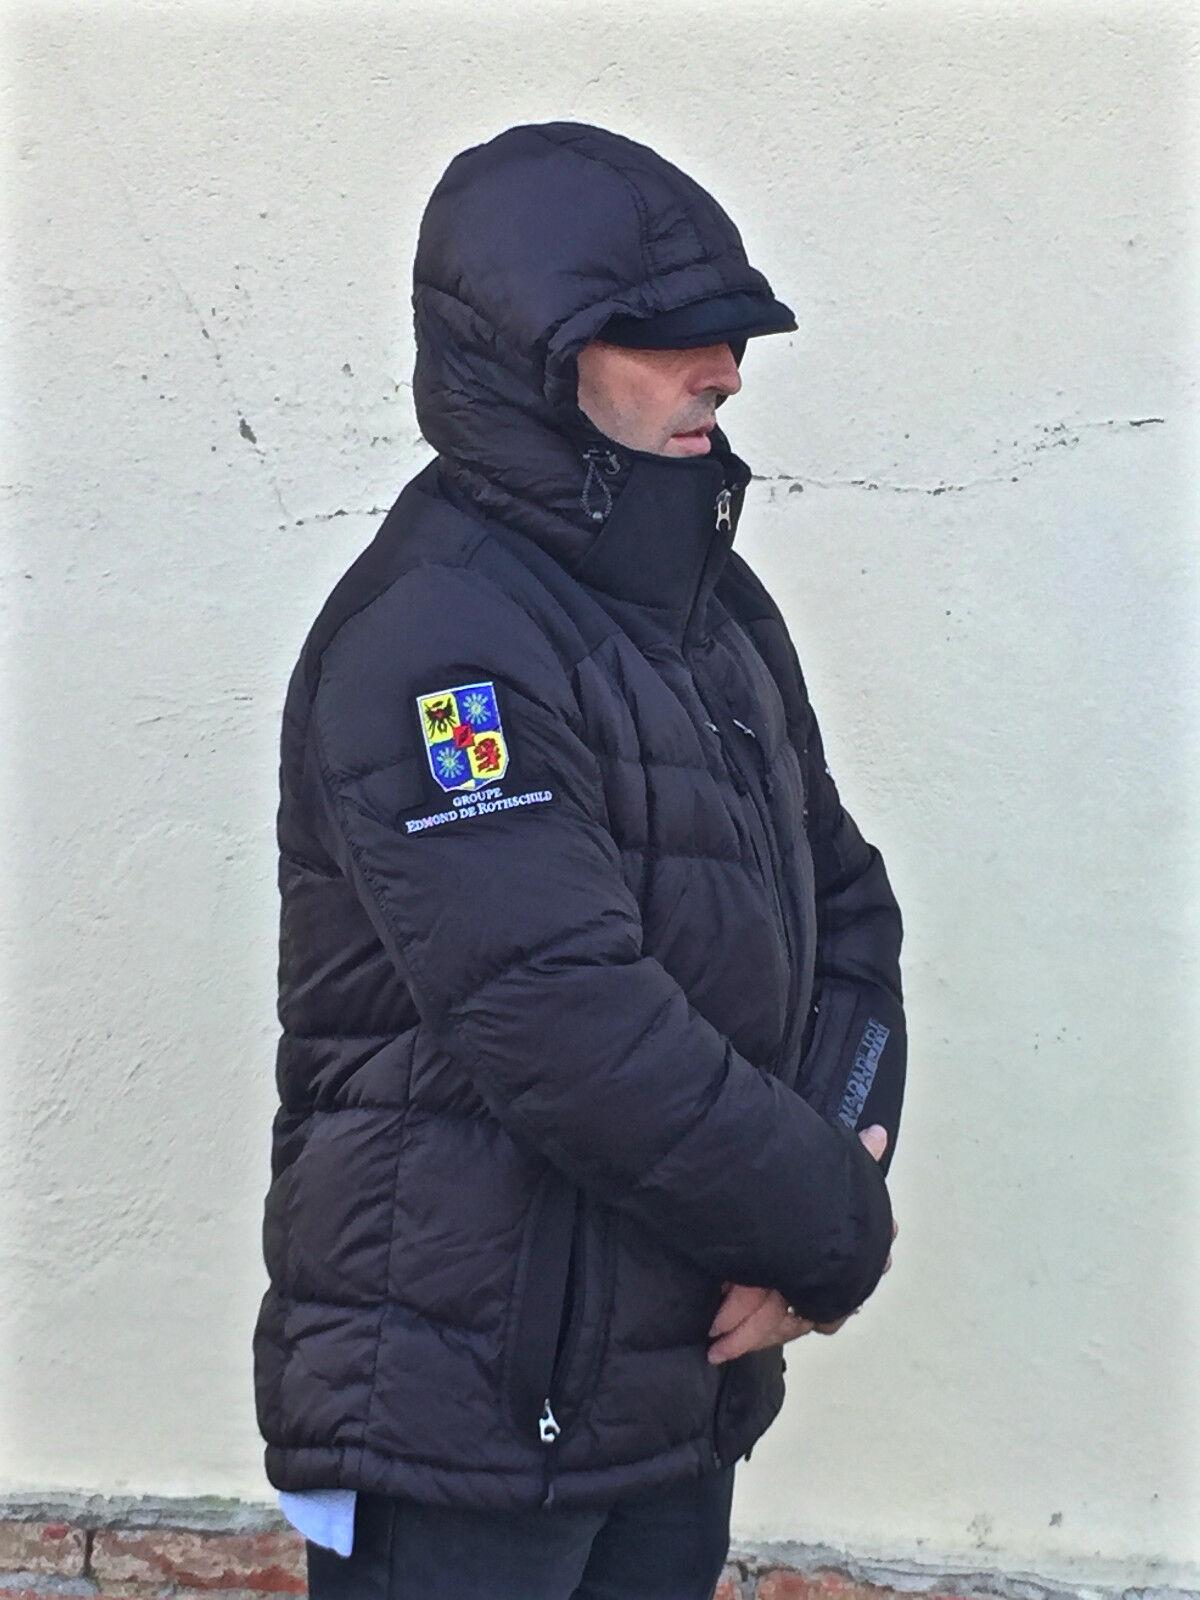 NAPAPIJRI esquí chaqueta COLECCIONISTA rolls-royce motor cars bolly talla talla talla L 350576